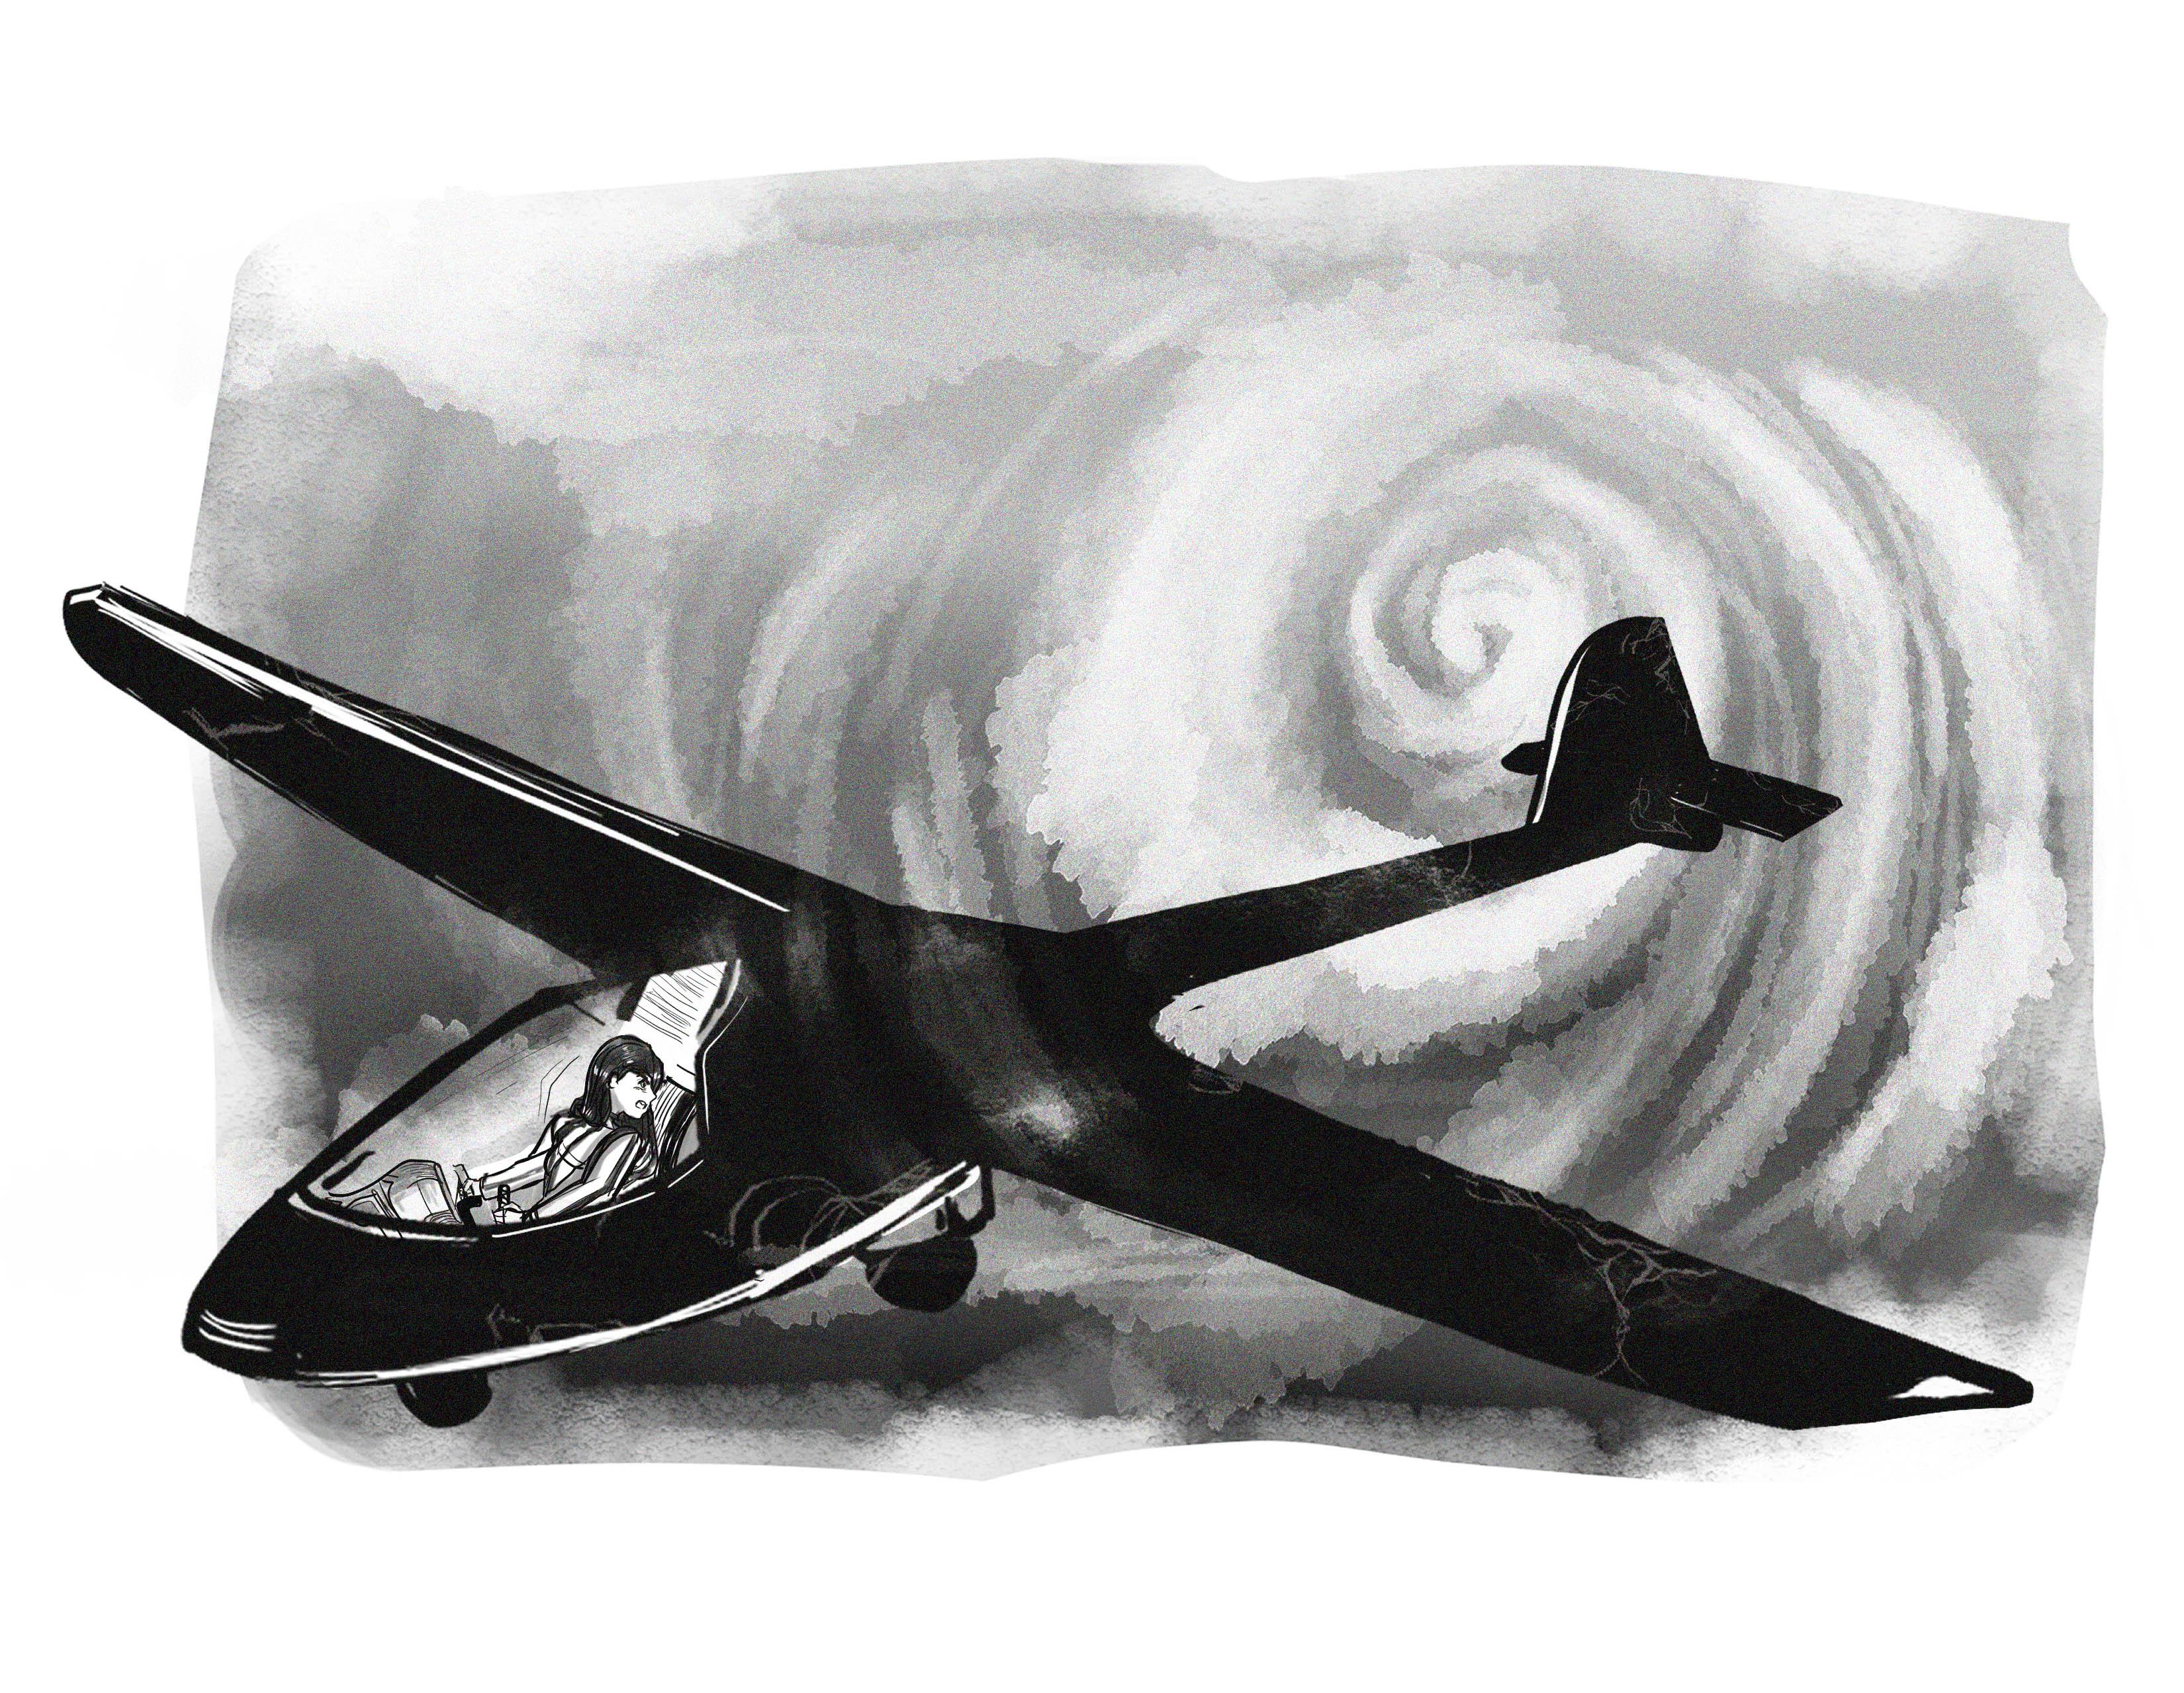 Sample chapter illustration